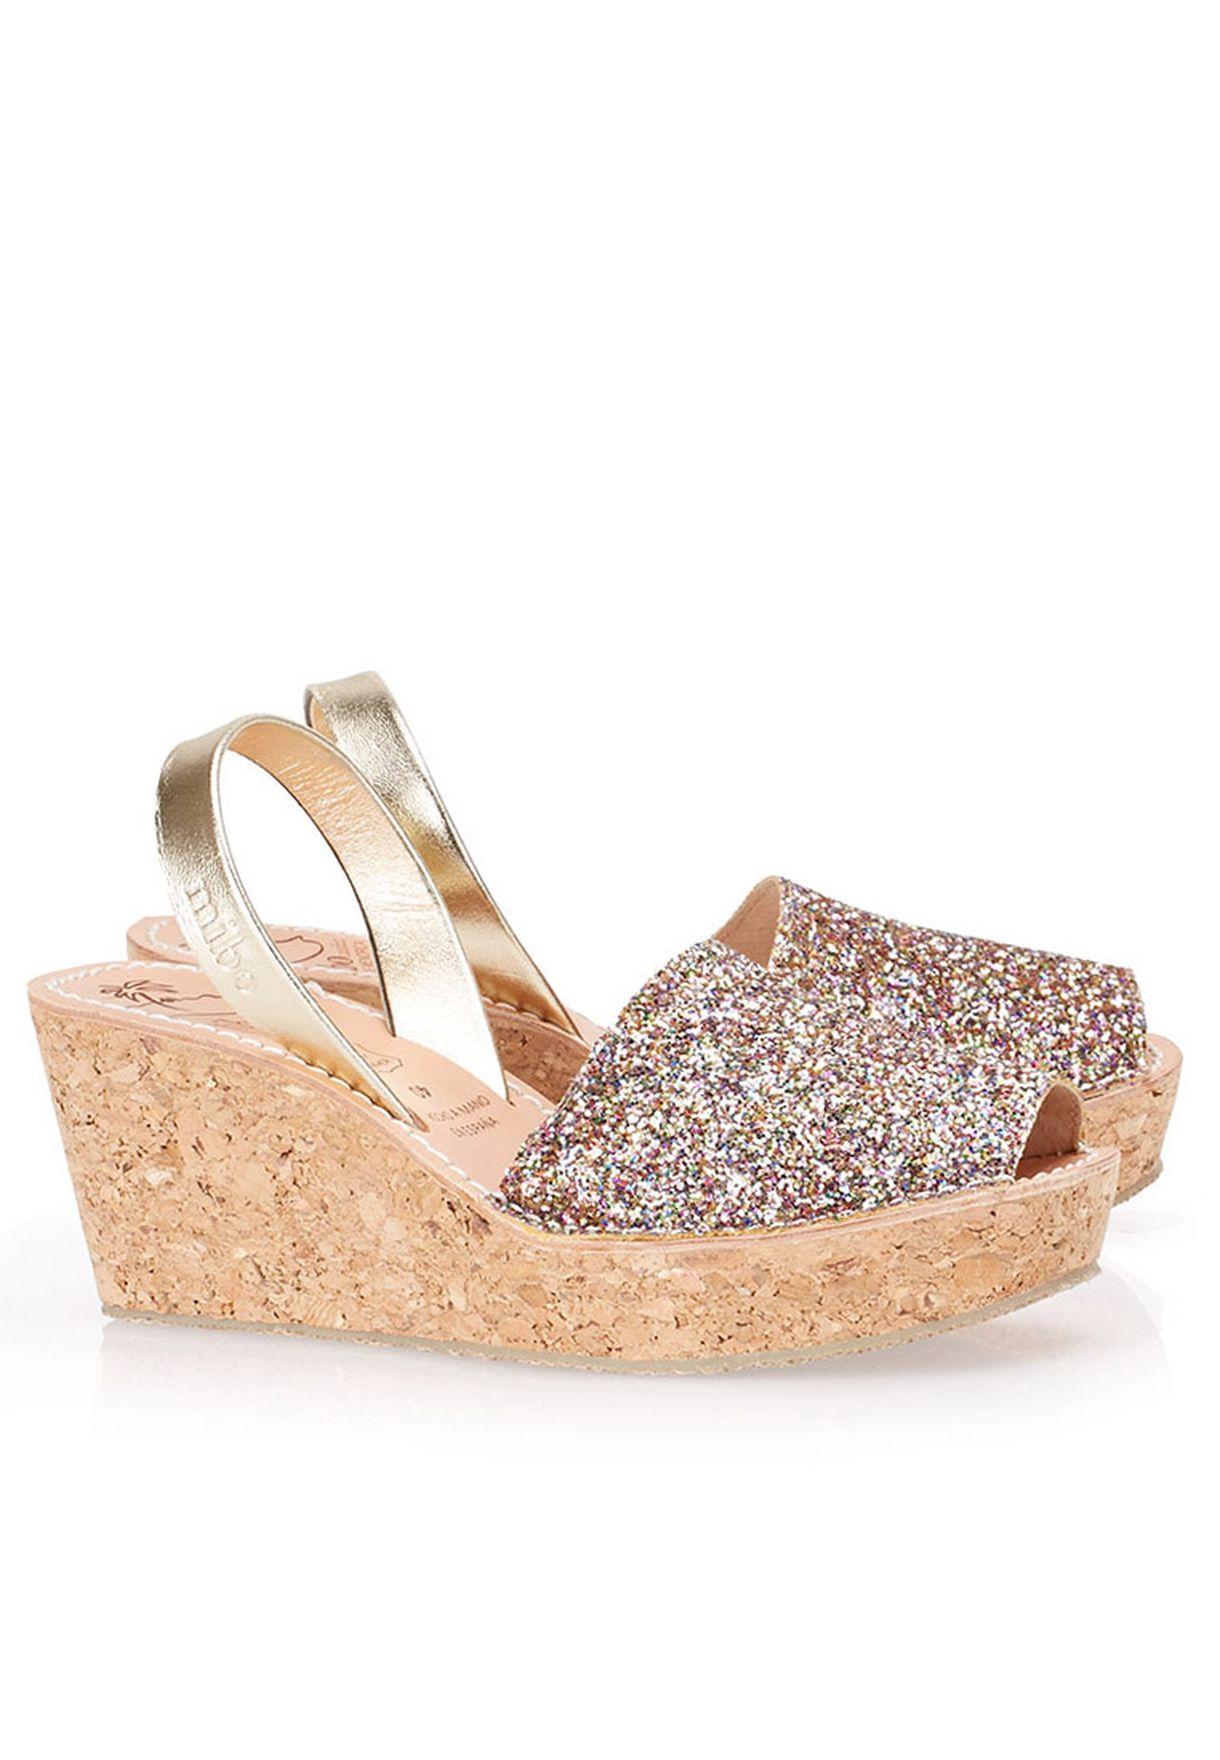 244edf84a Shop Mibo multicolor Glitter Wedge Sandals 182-003656 for Women in ...